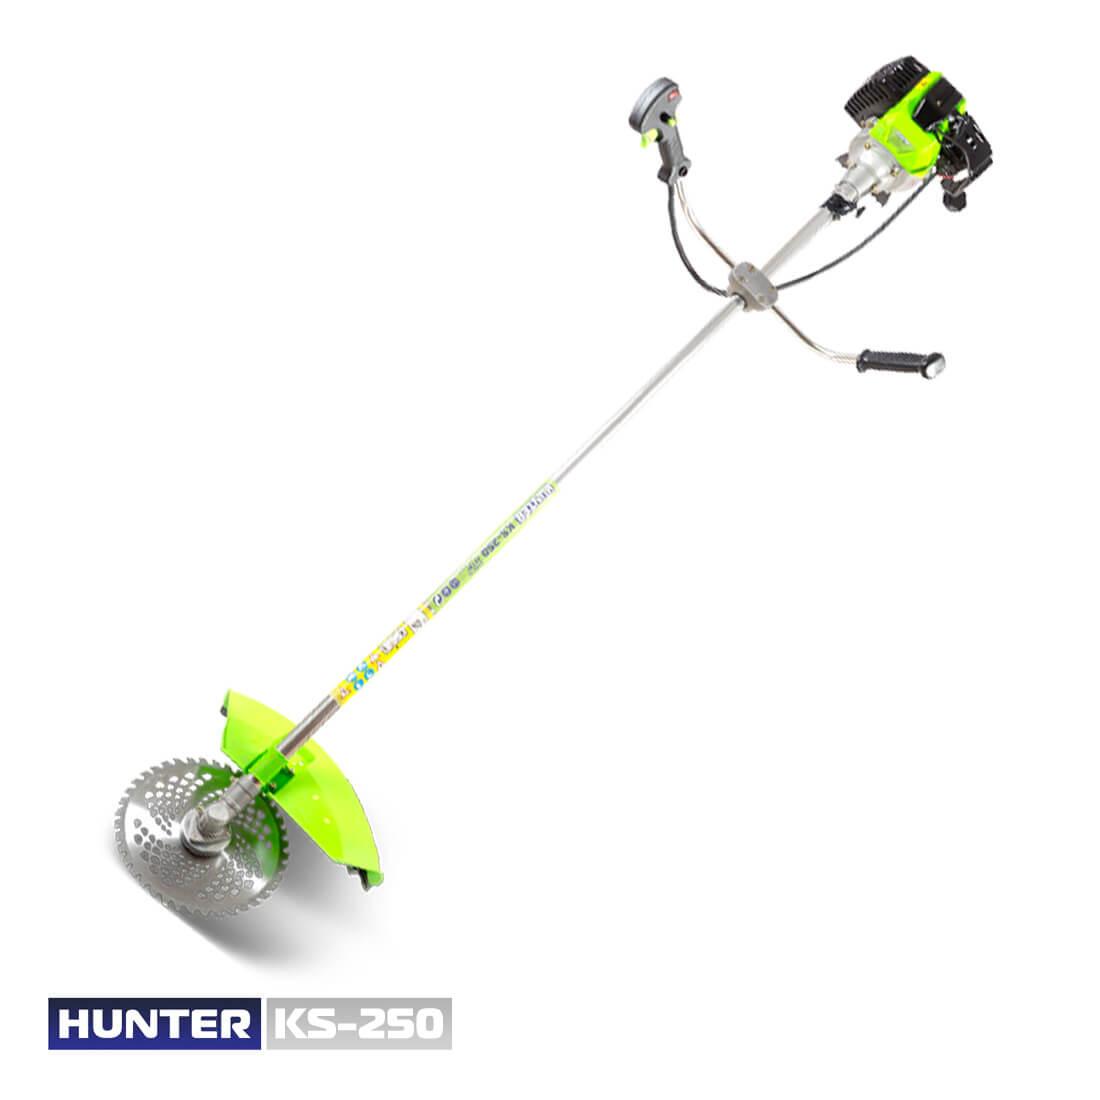 Фото Hunter KS-250 цена 2670грн №7 — Hunter